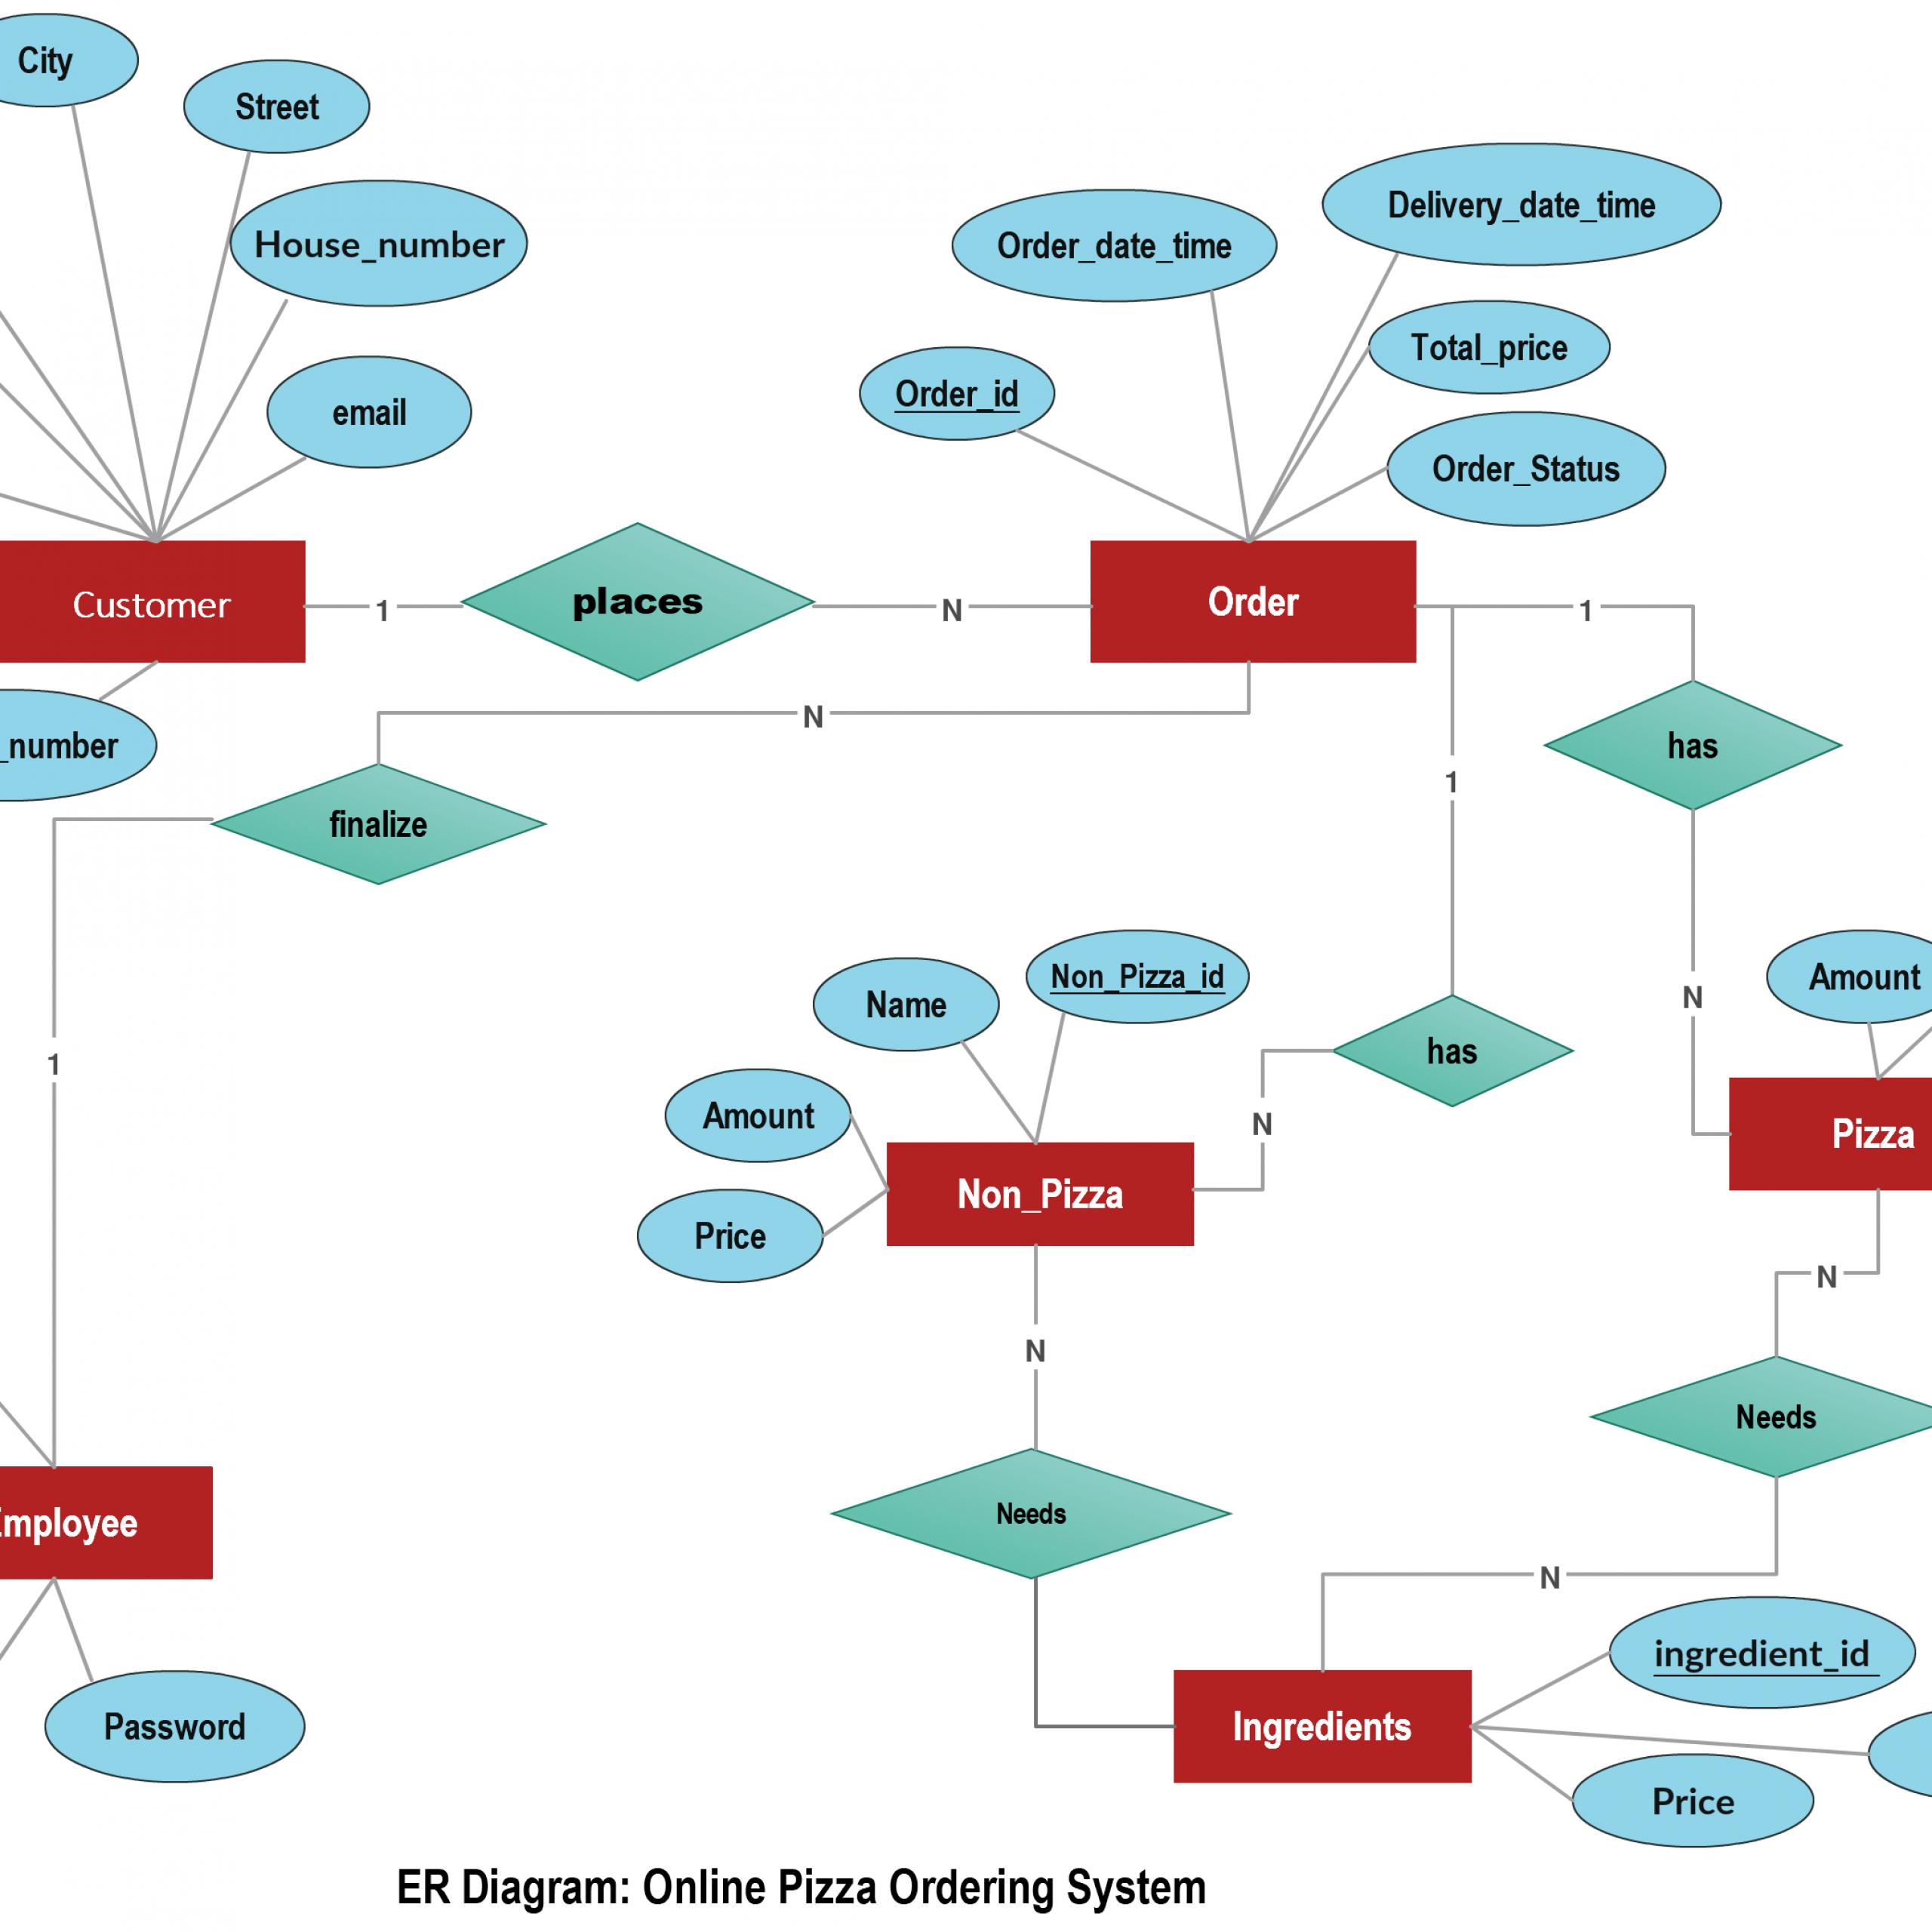 Online Pizza Ordering System Illustrated Using An Er Diagram inside Draw A Er Diagram Online